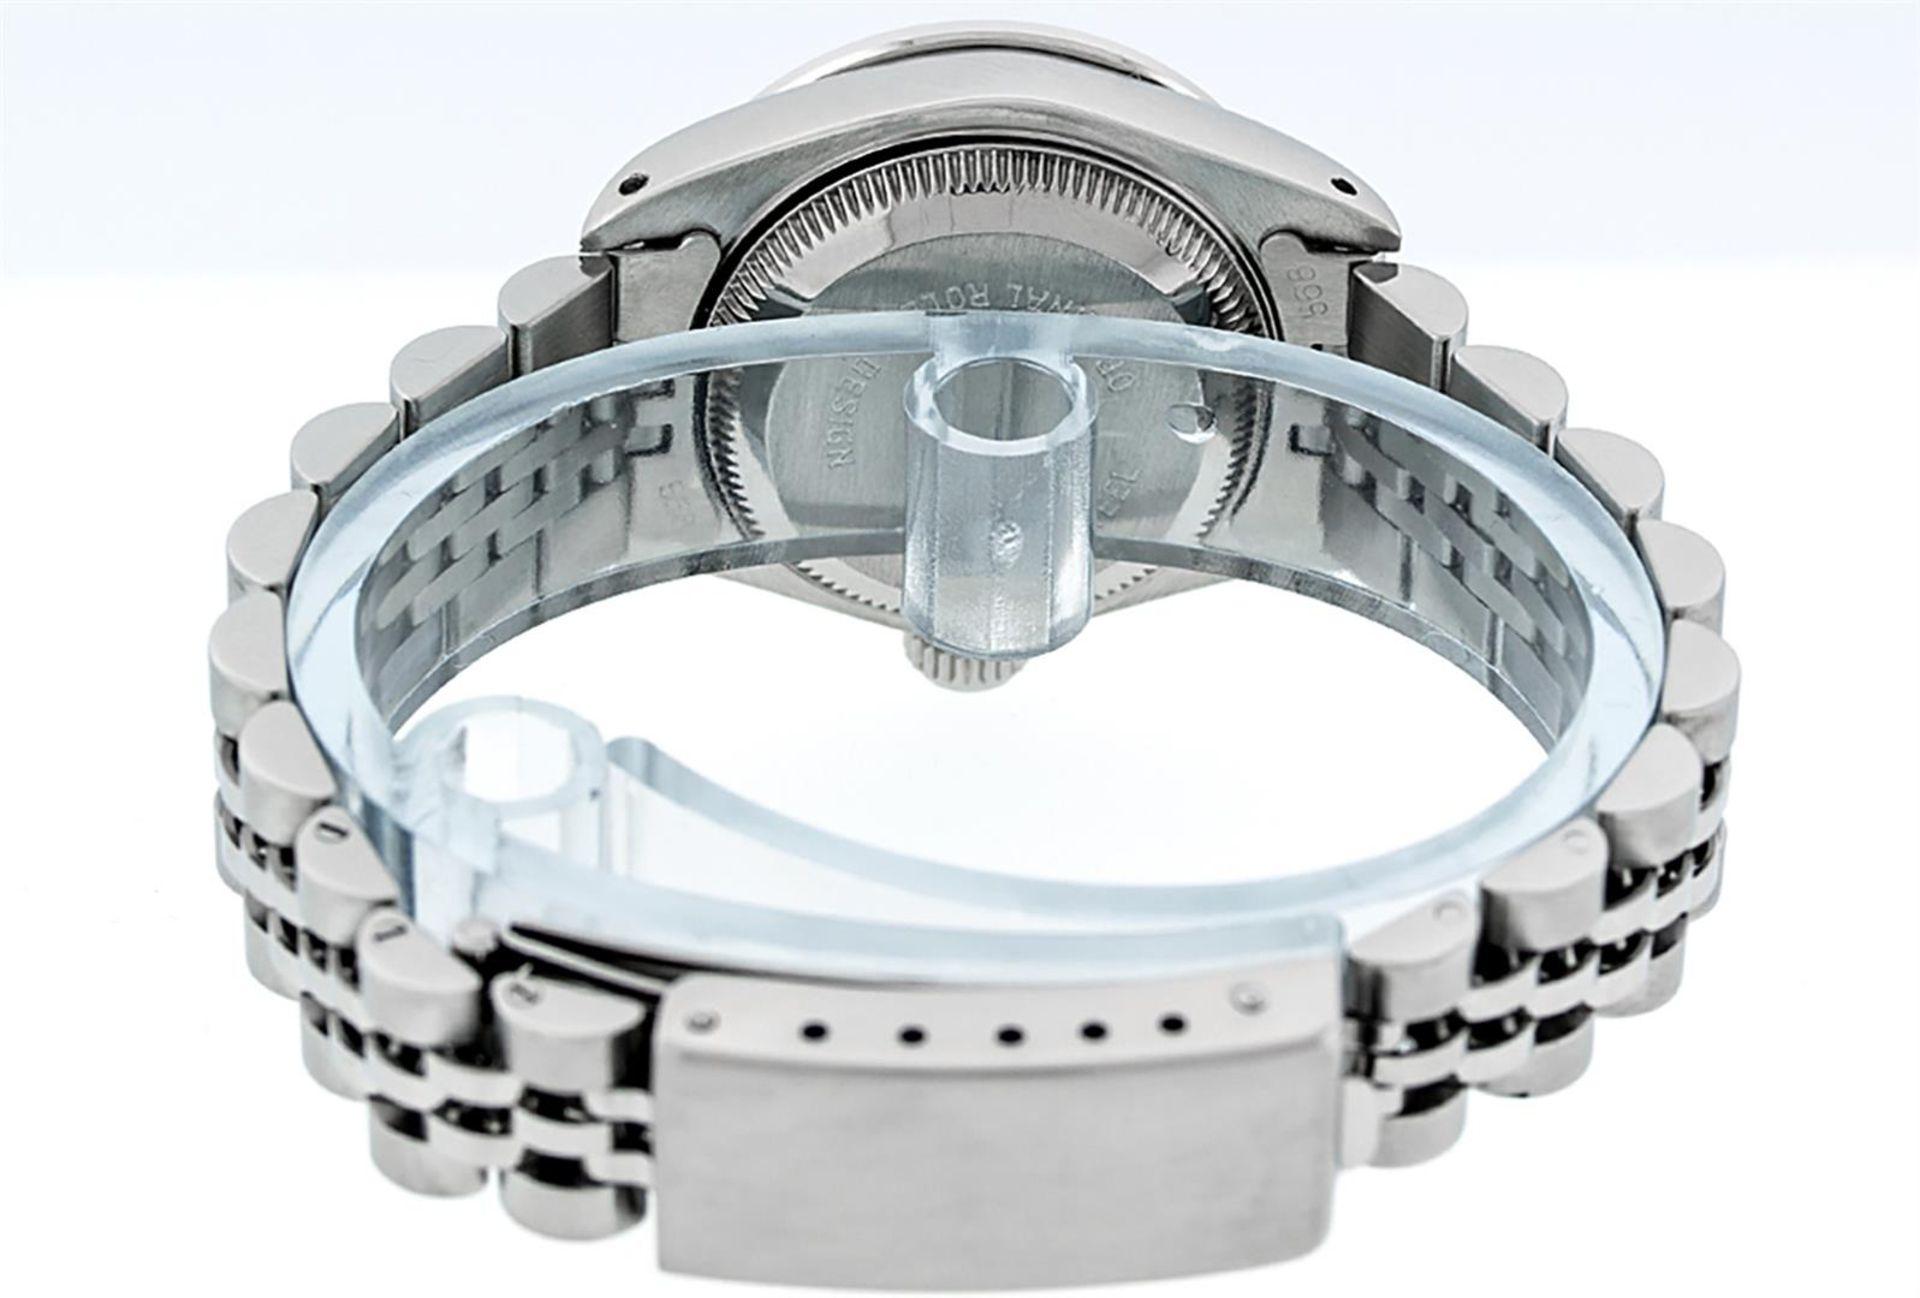 Rolex Ladies Stainless Steel 26MM Orange String Diamond Lugs Datejust Wristwatch - Image 8 of 9